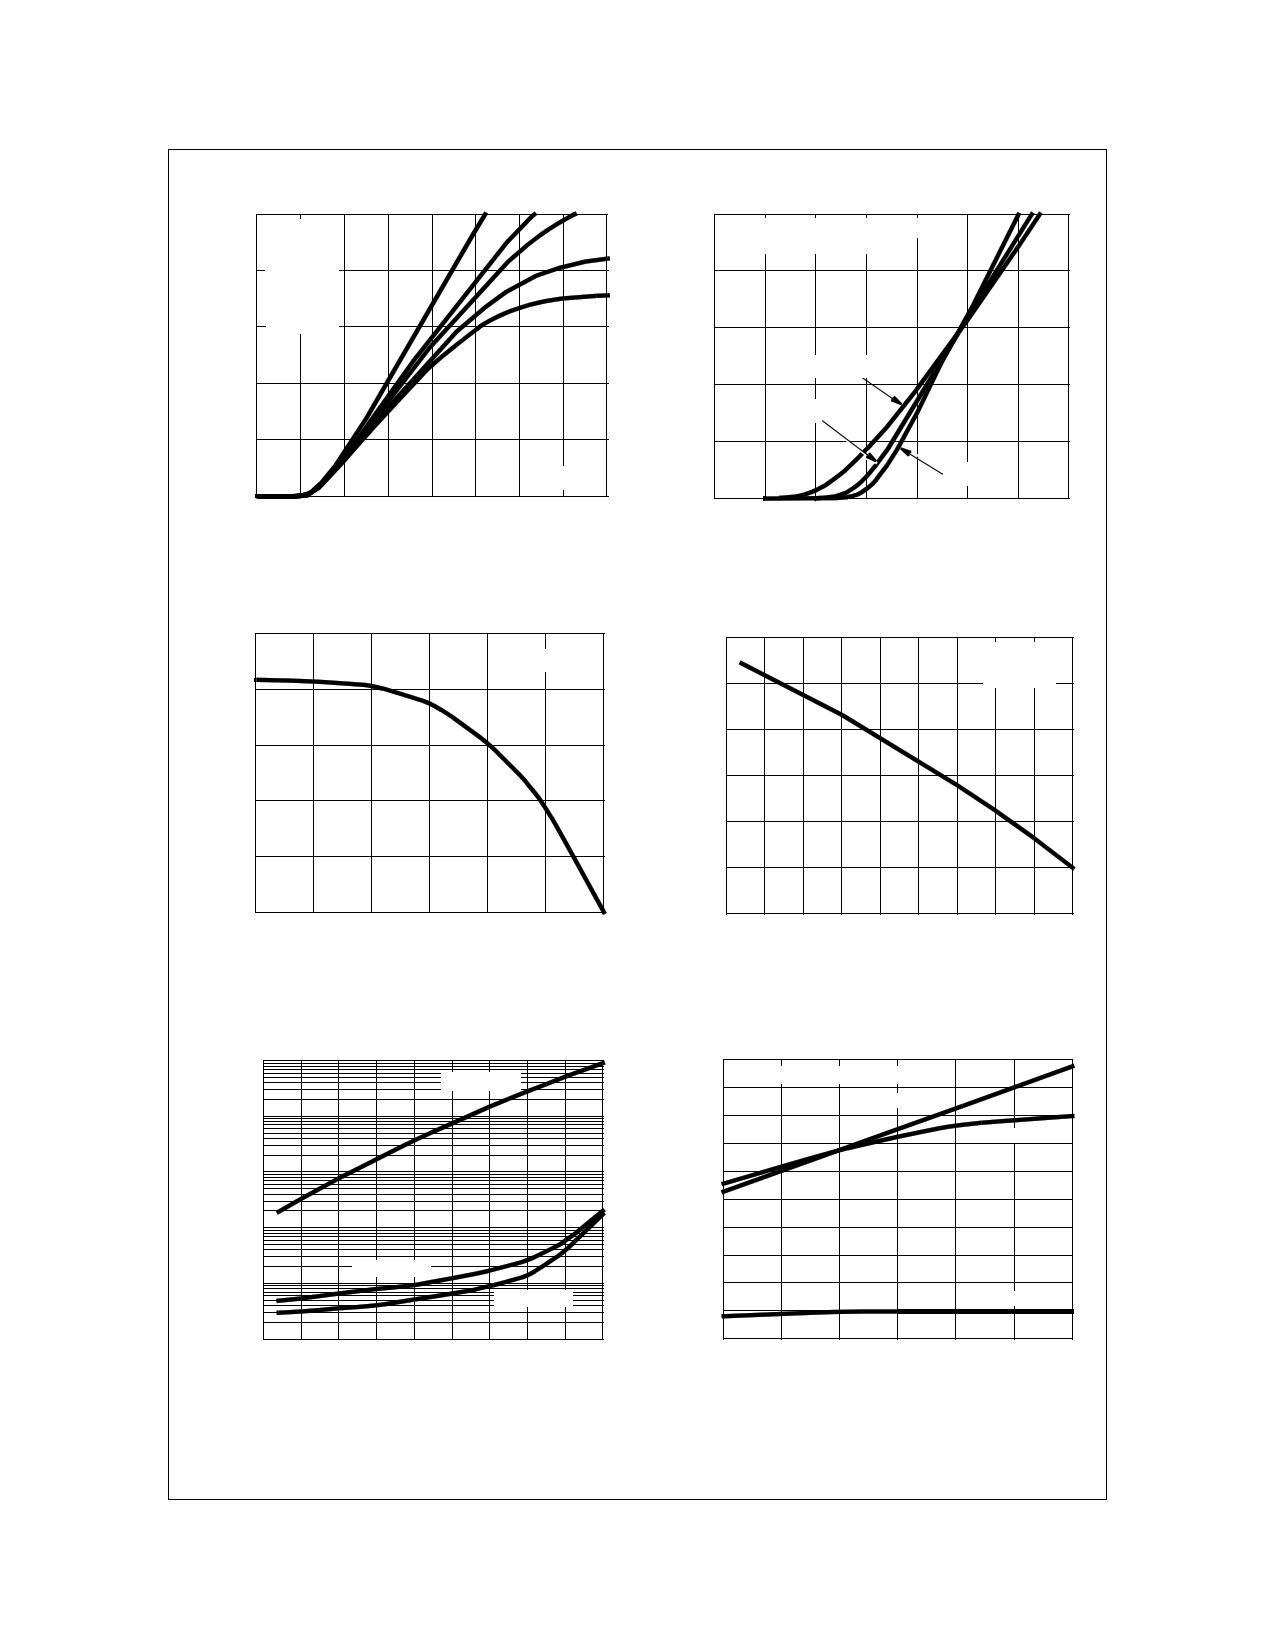 ISL9V3040D3S pdf, 반도체, 판매, 대치품